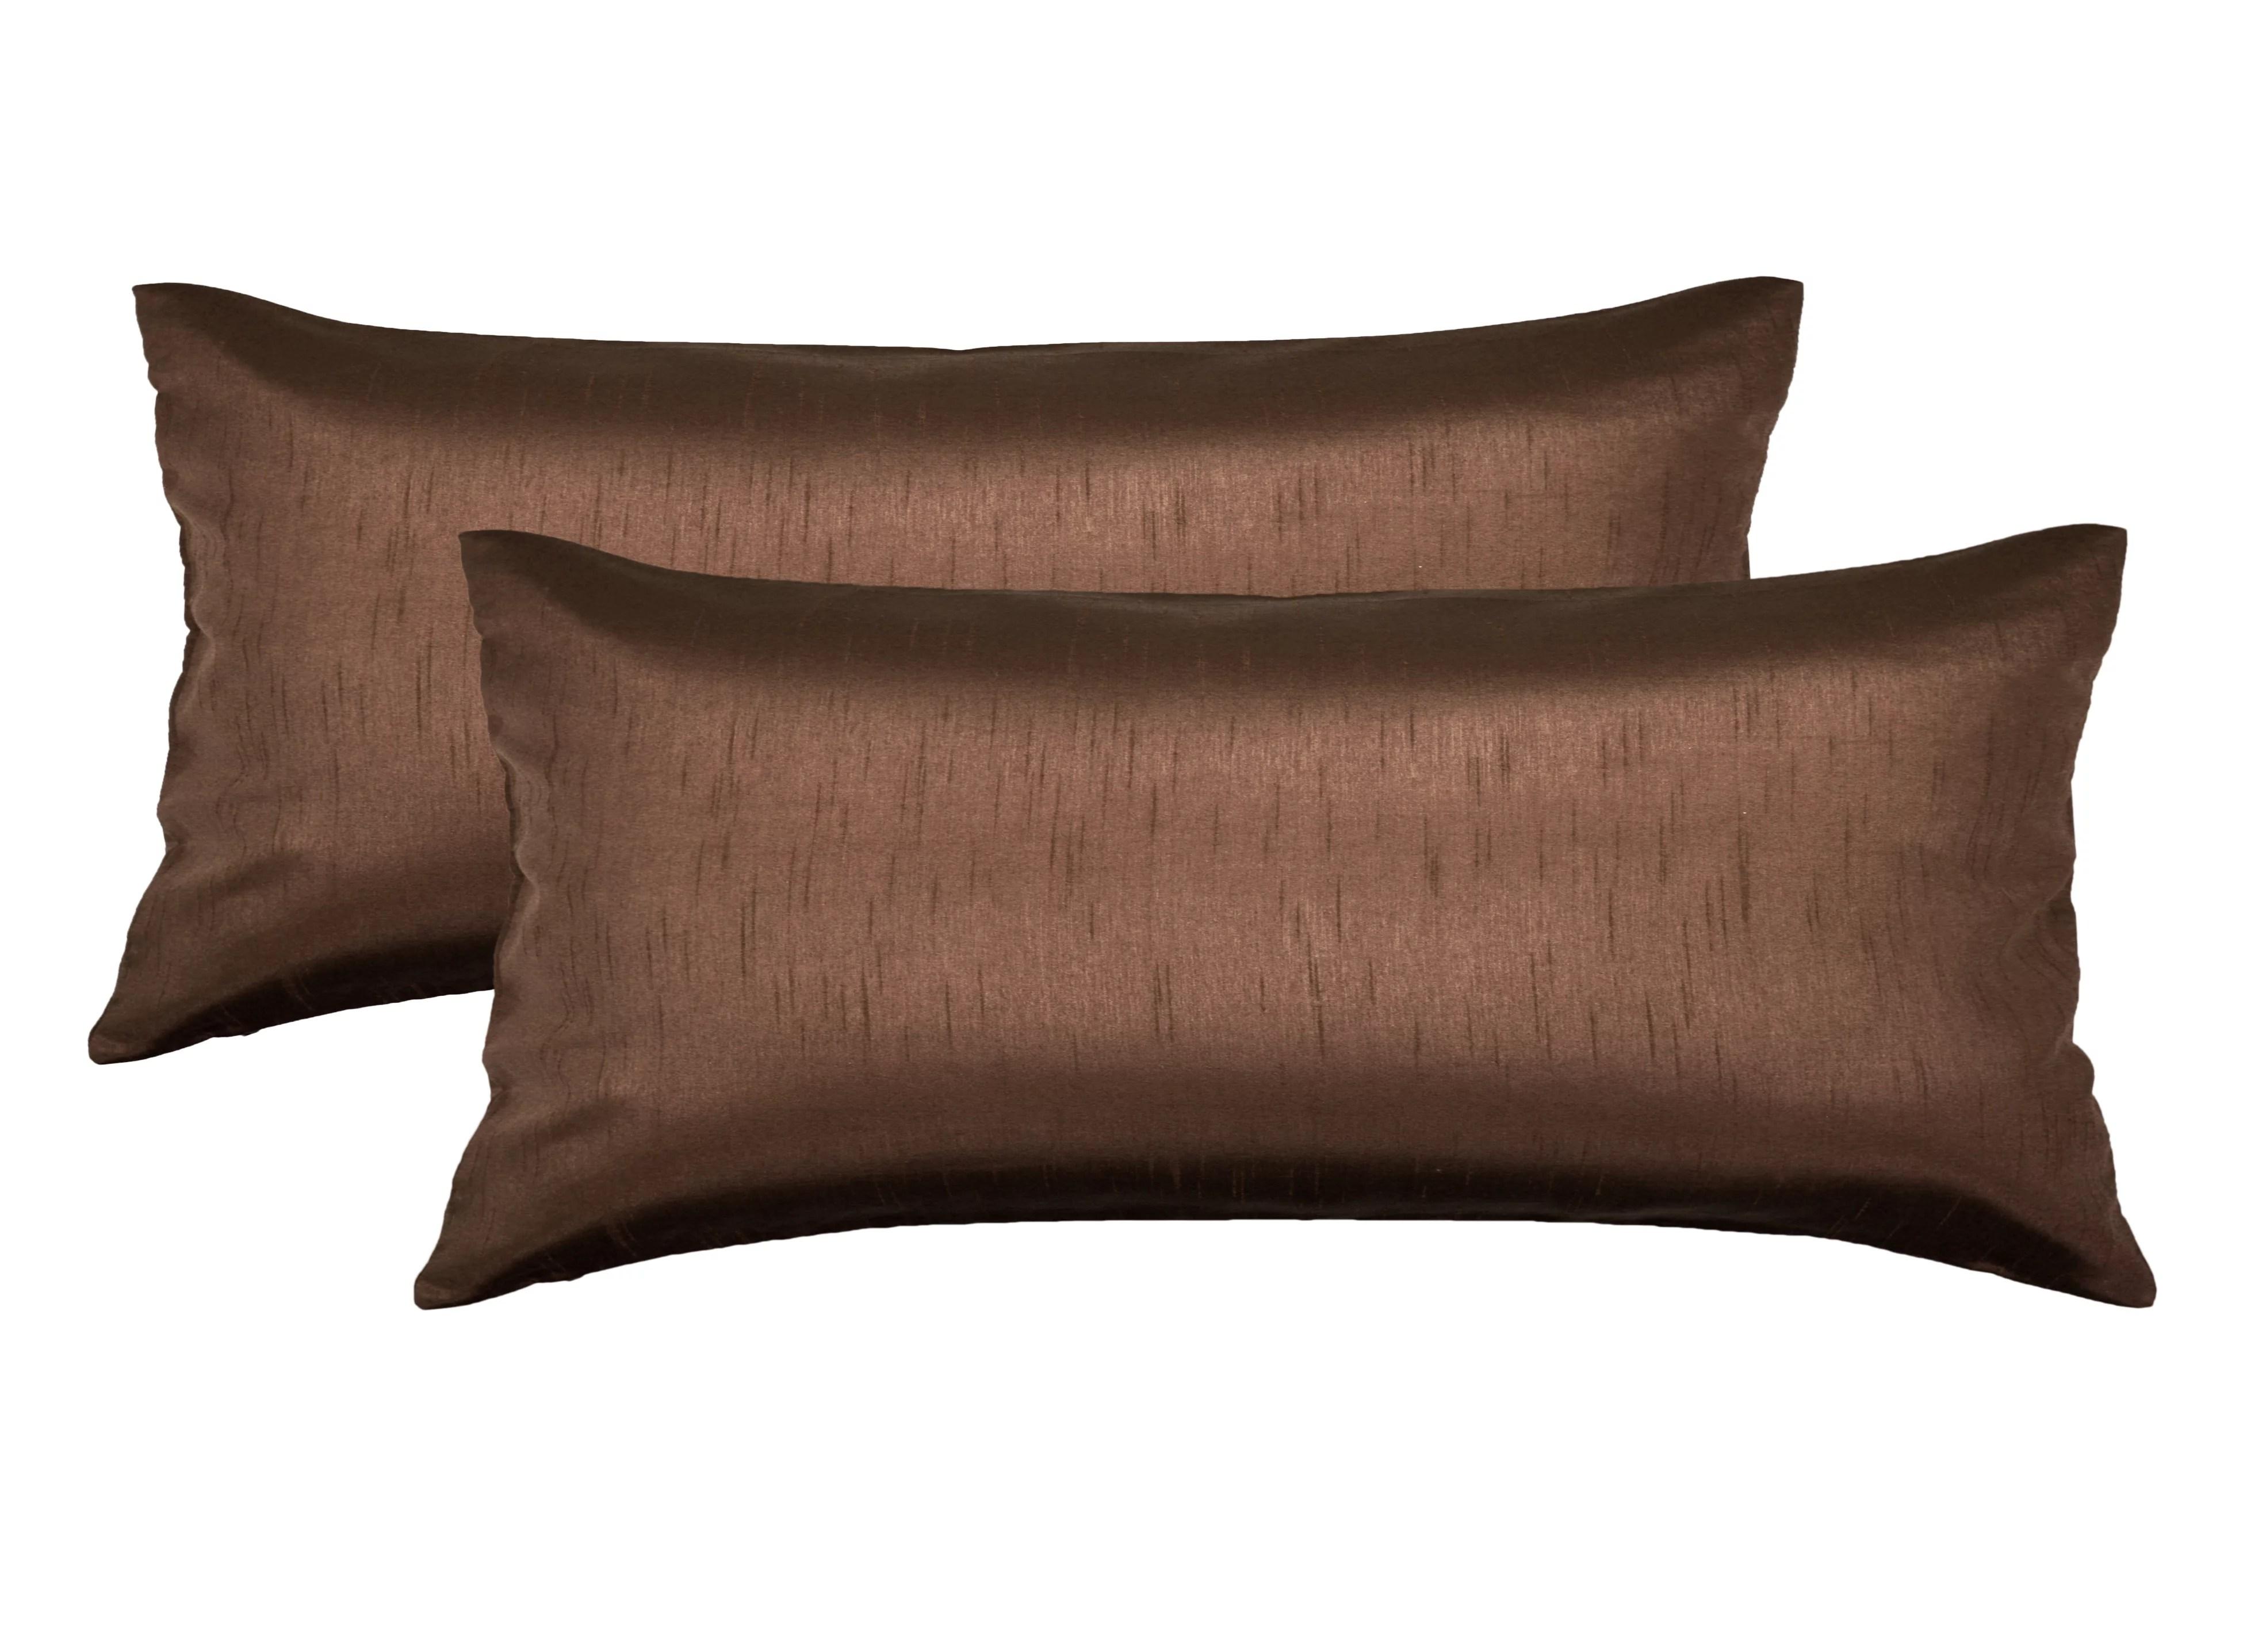 aiking home 12x24 inches faux silk rectangular throw pillow cover zipper closure brown set of 2 walmart com